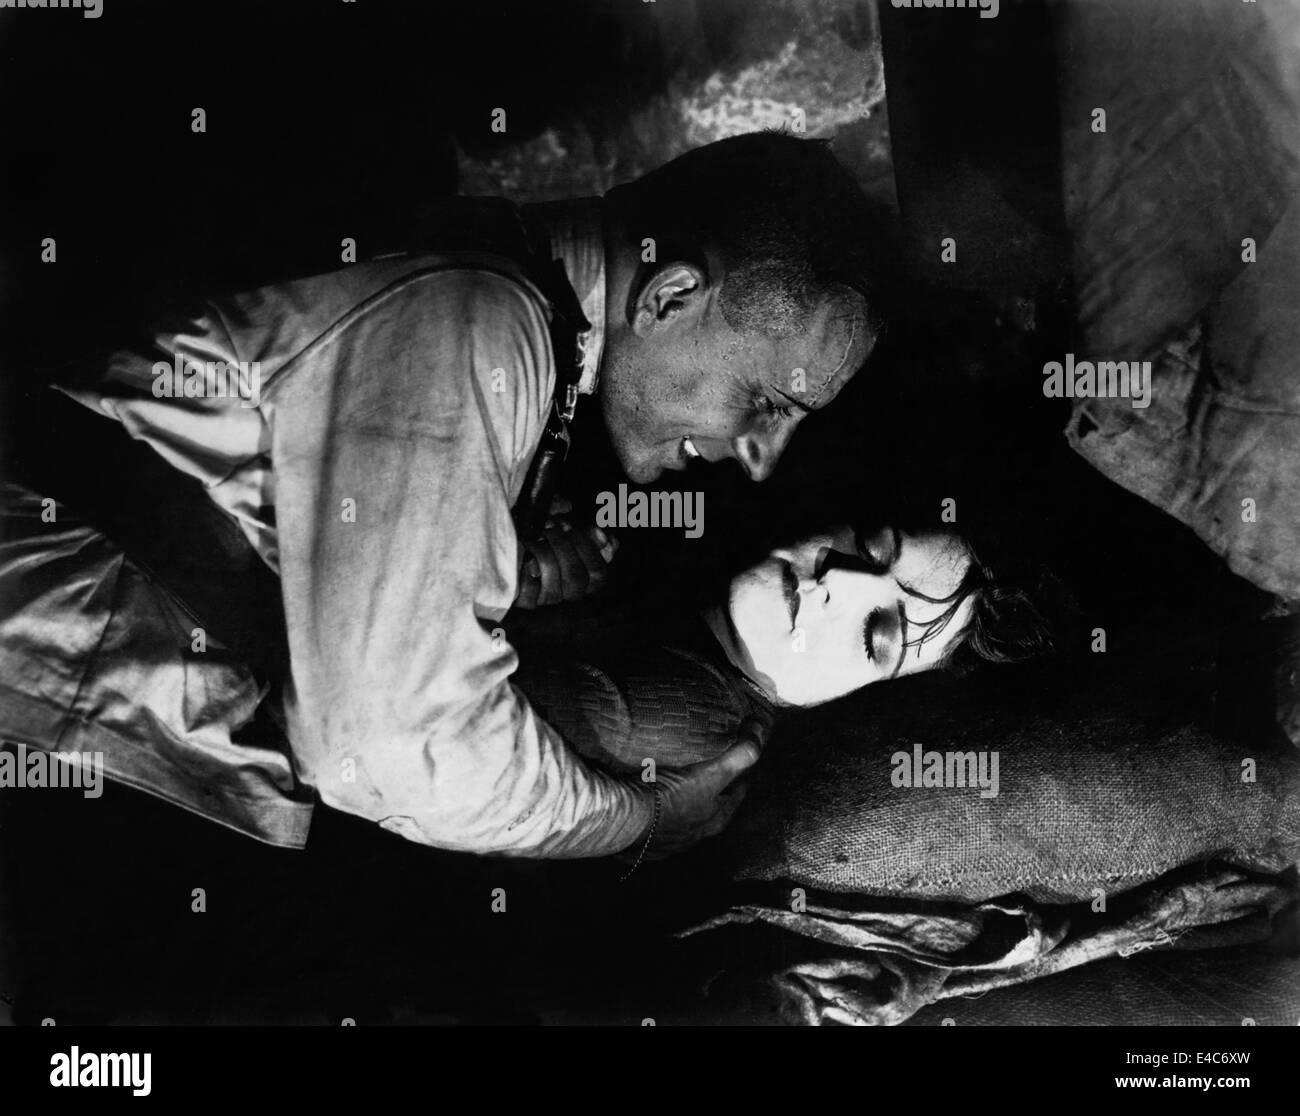 JoJo (singer),Chynna Ortaleza (b. 1982) Erotic pictures Jeanne Eagels,Ginger Rogers